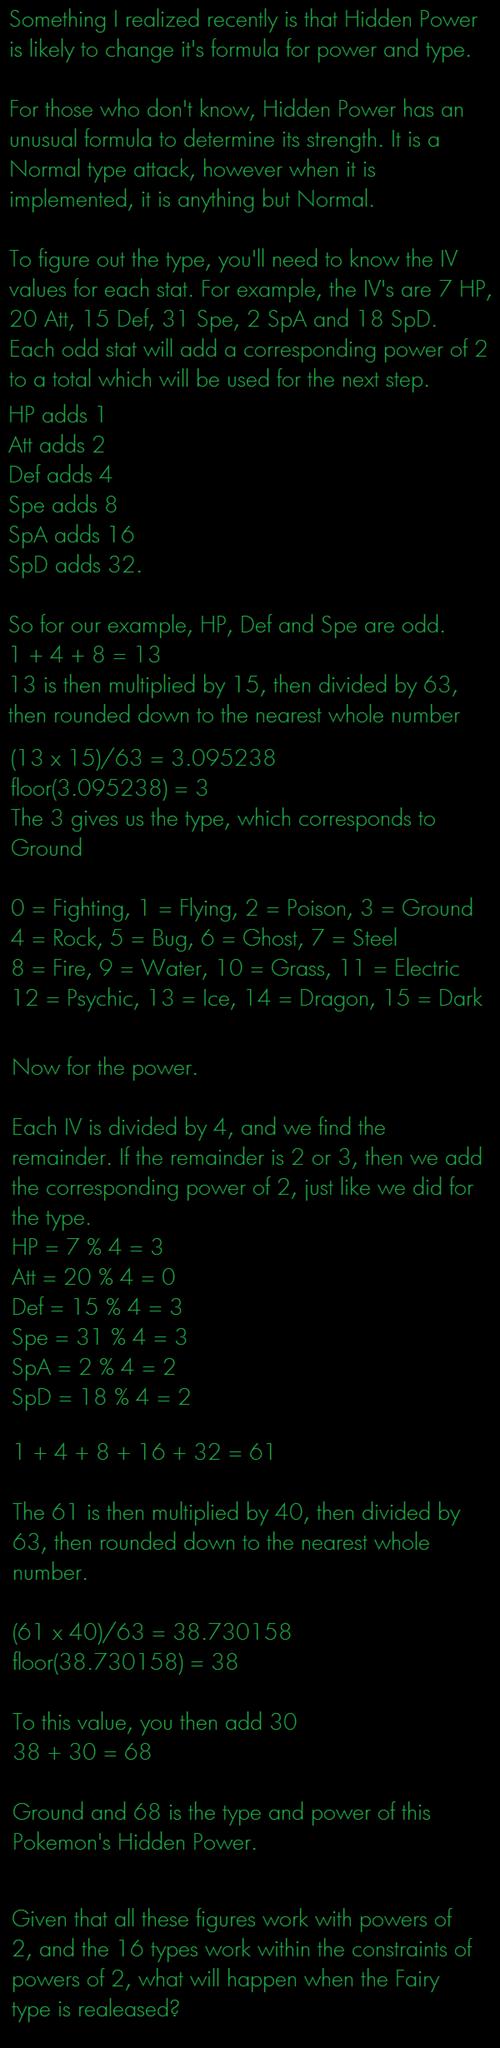 Pokémon theories hidden power - 7669699584